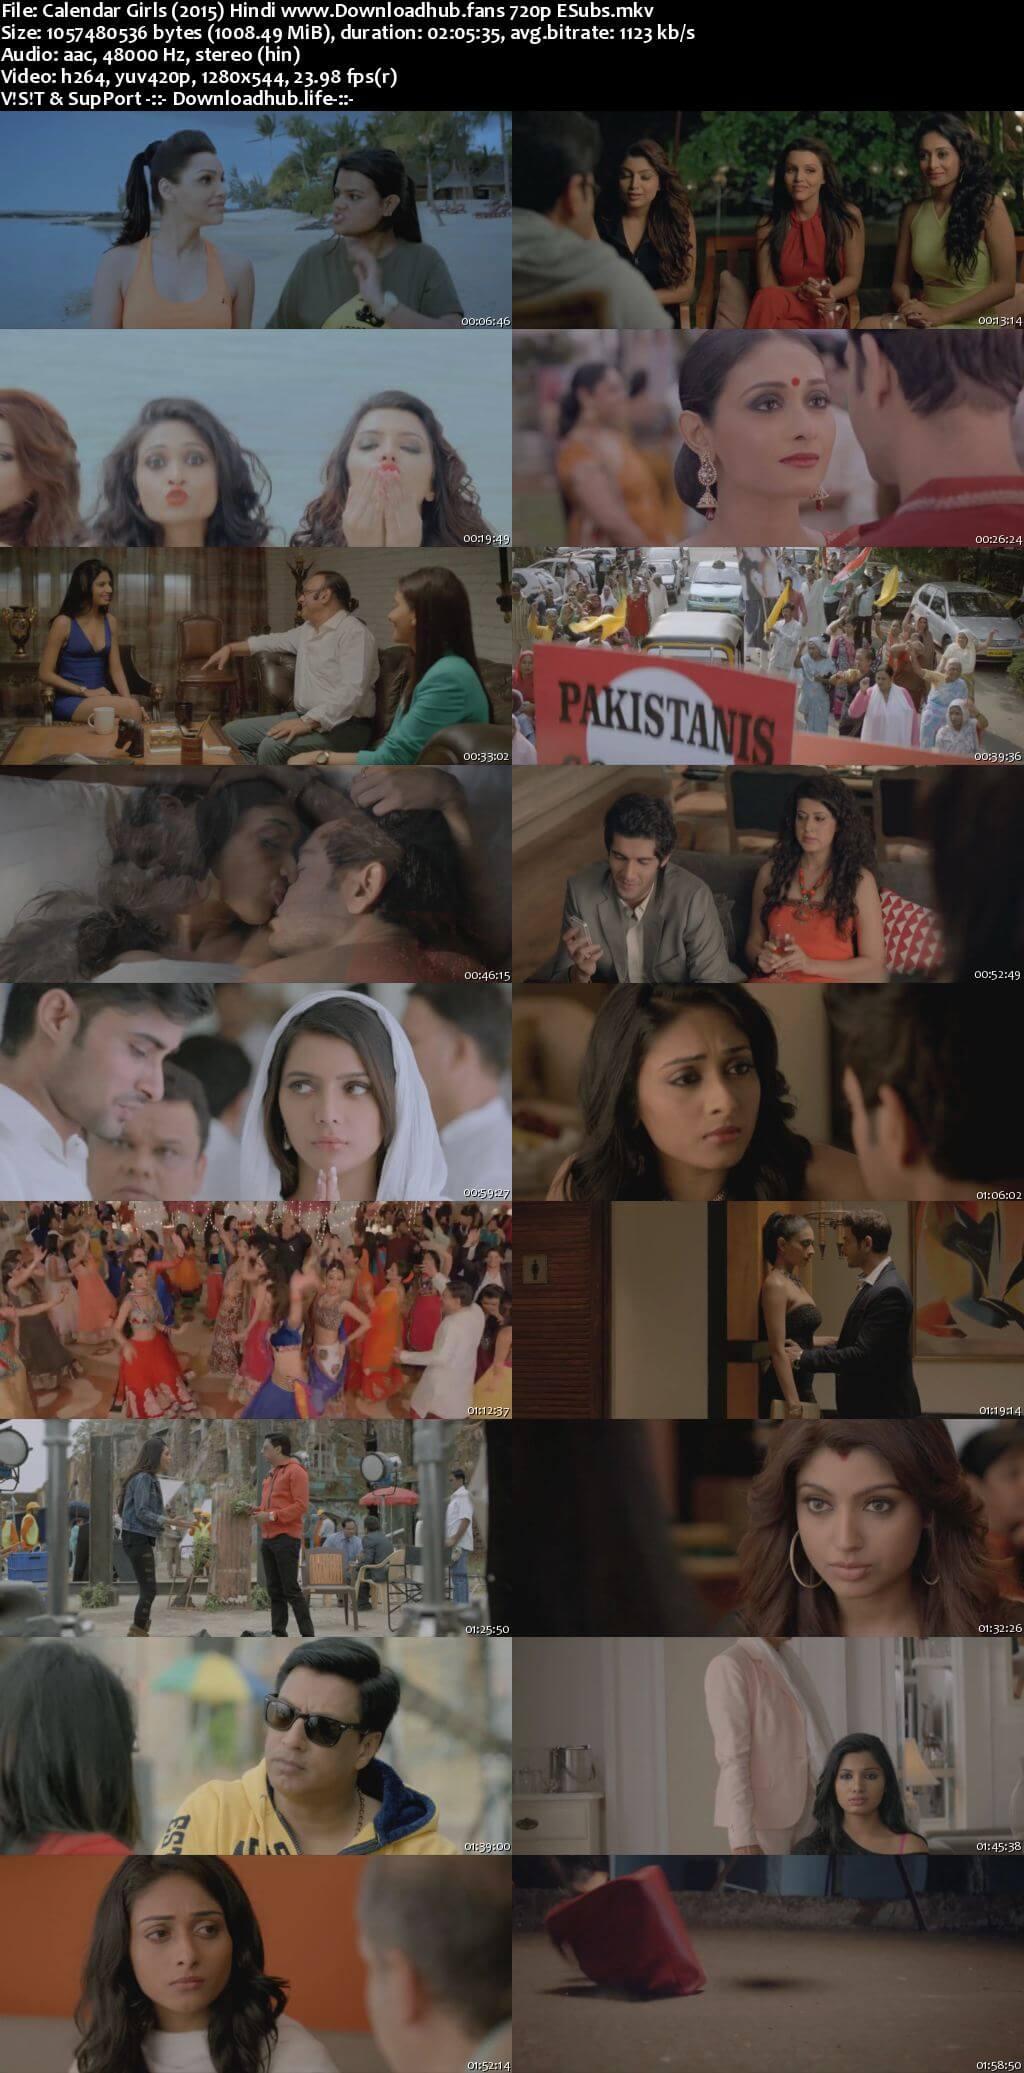 Calendar Girls 2015 Hindi 720p HDRip ESubs